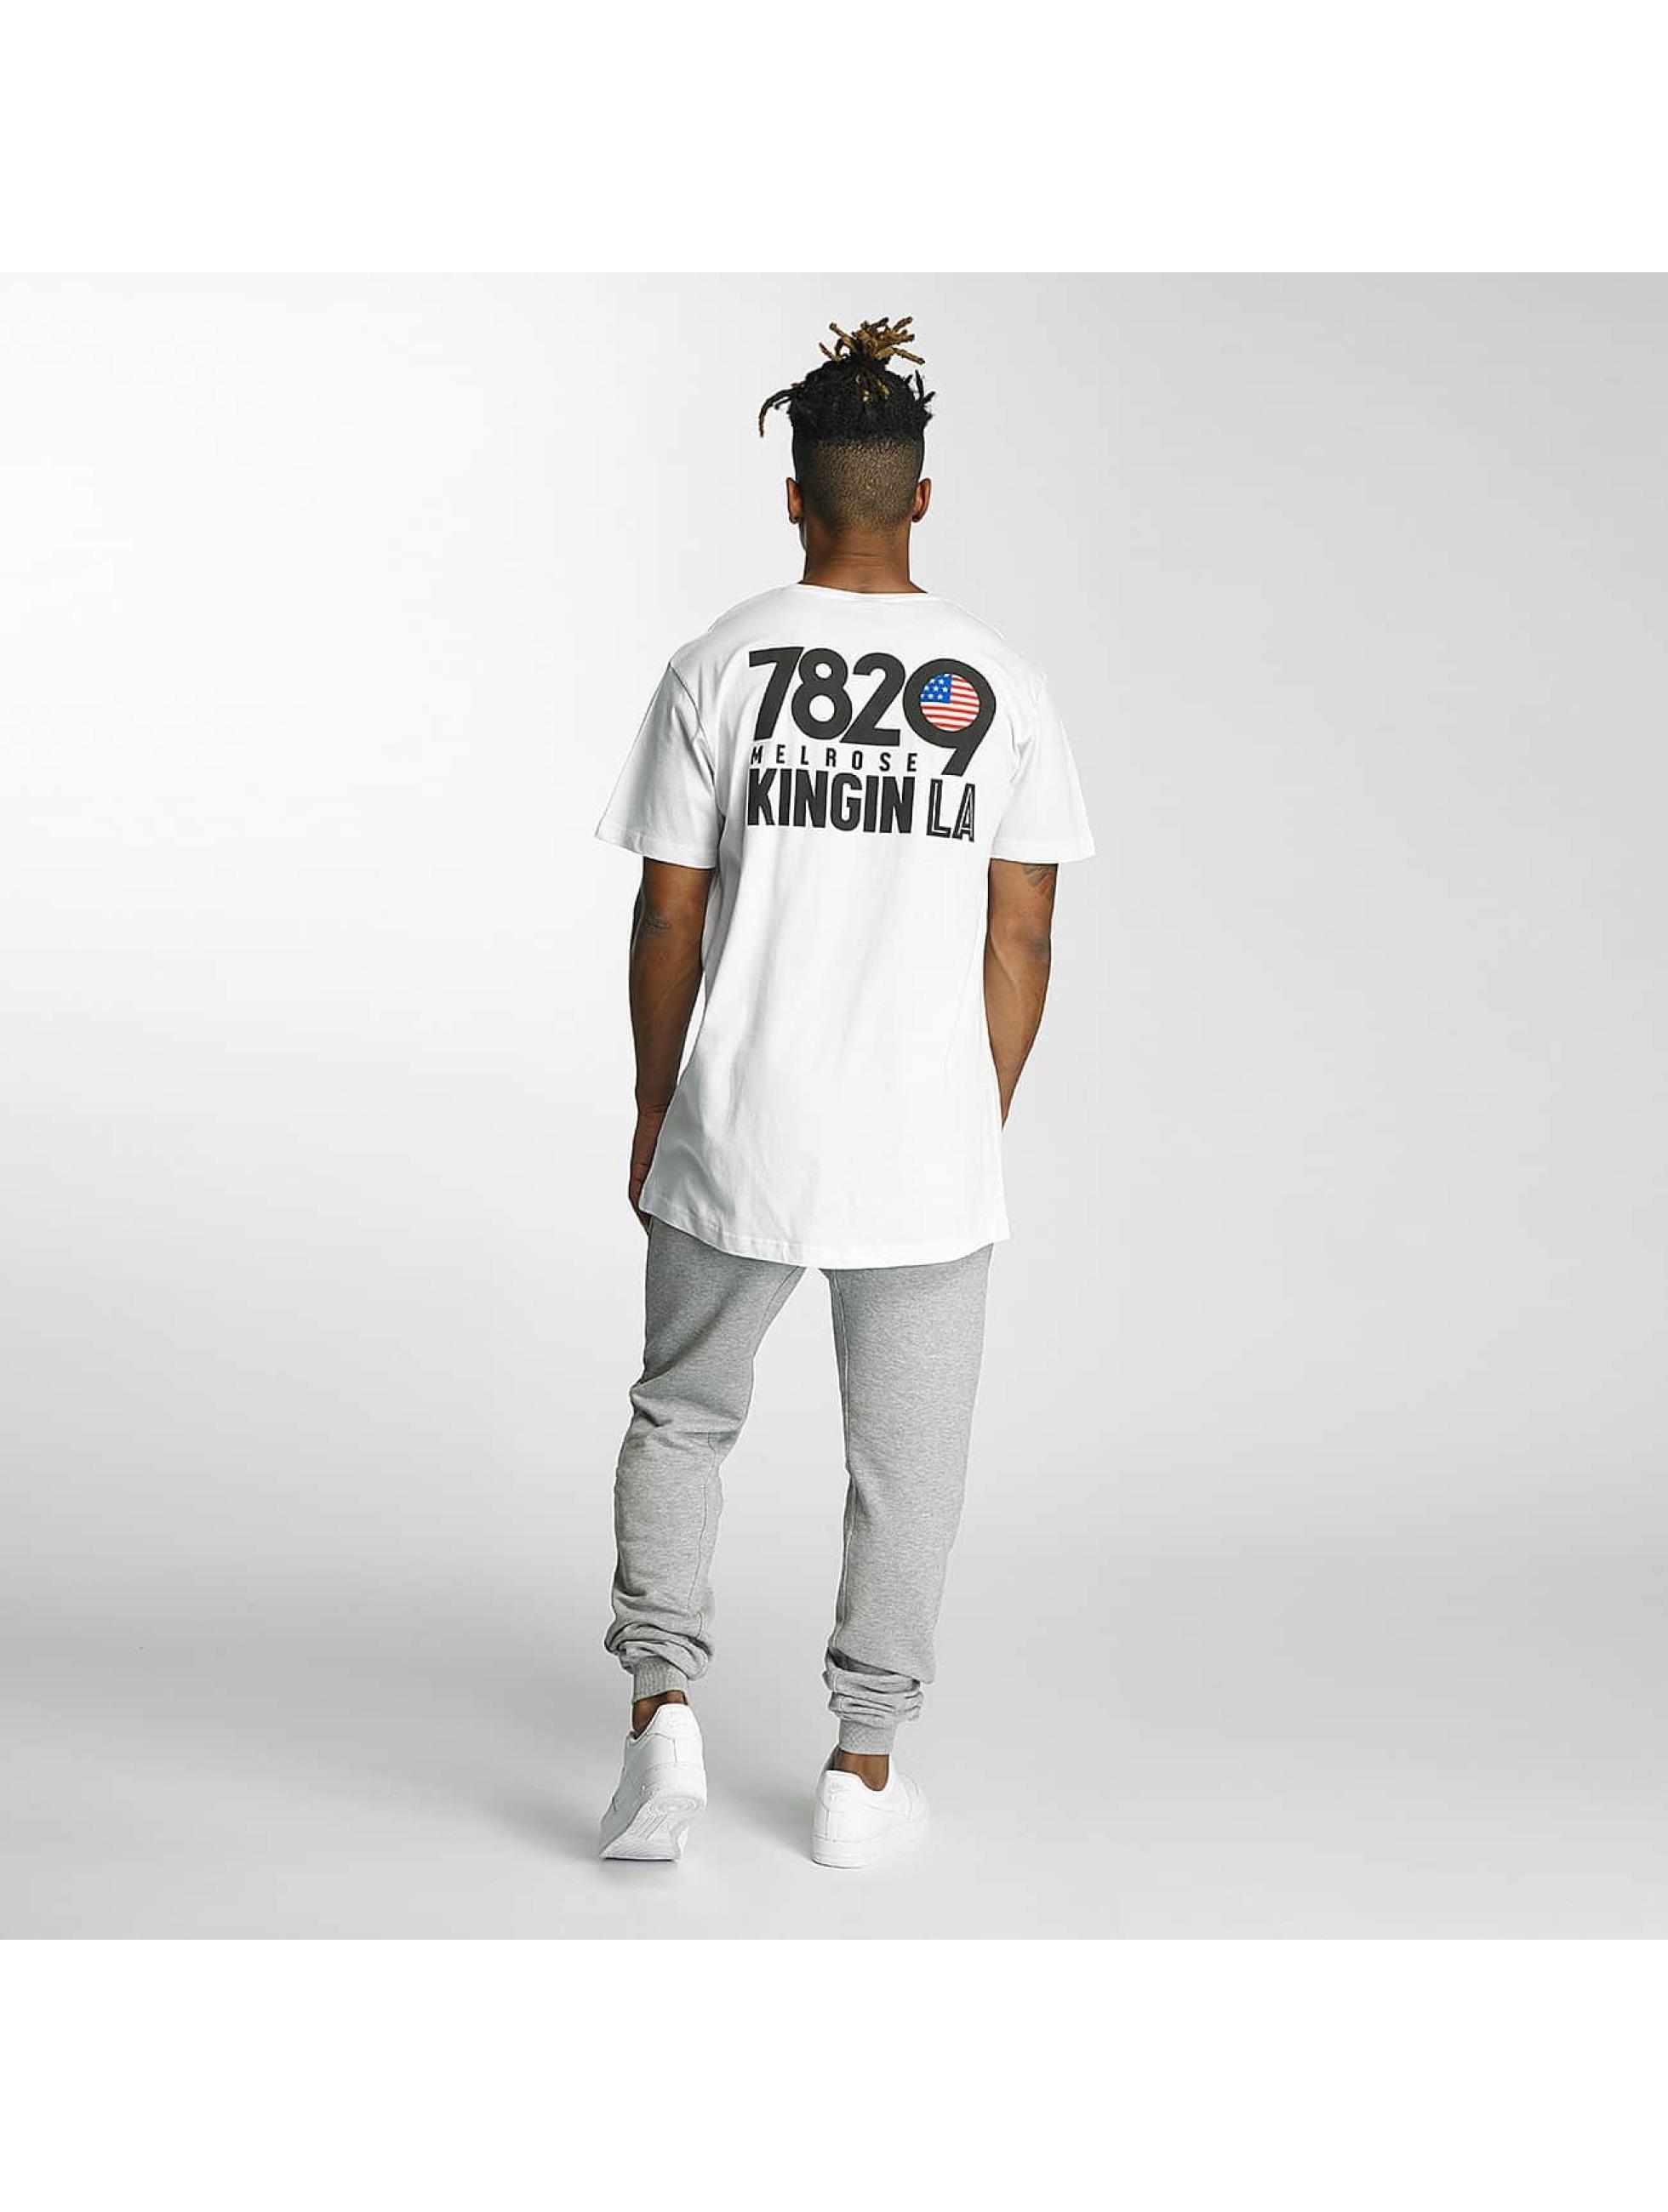 Kingin T-Shirt Melrose weiß